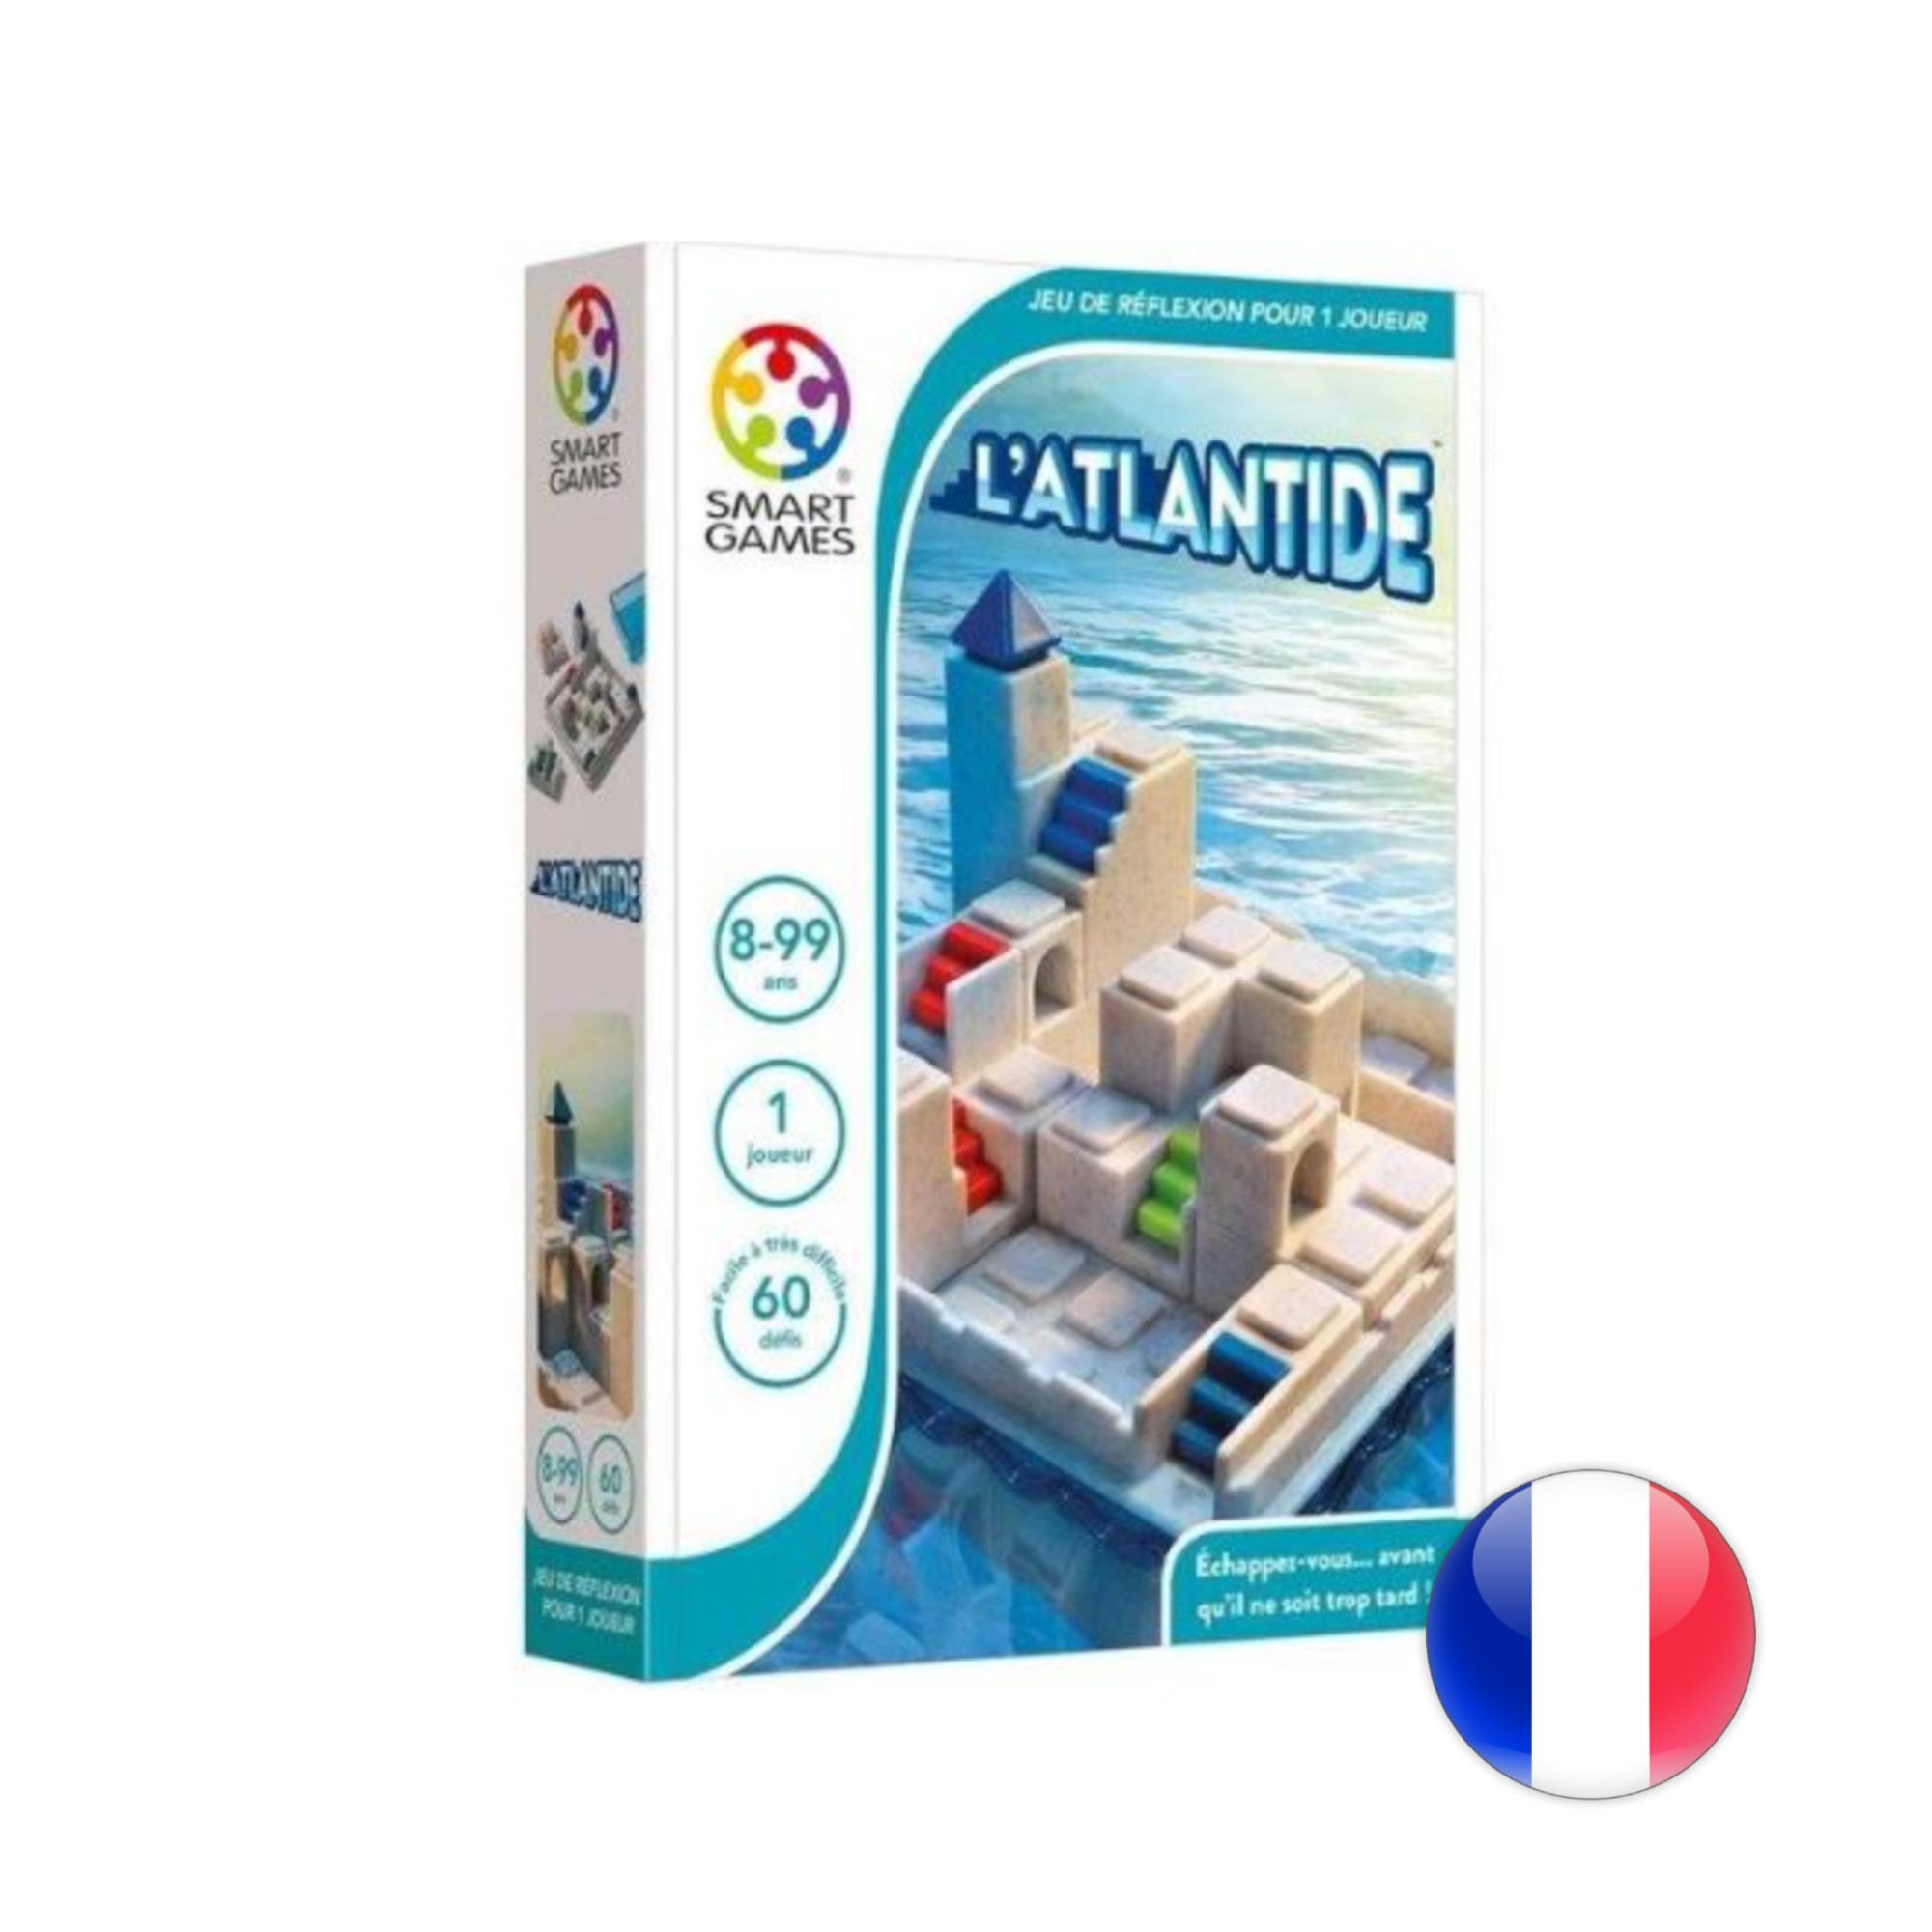 Smart Games L'Atlantide